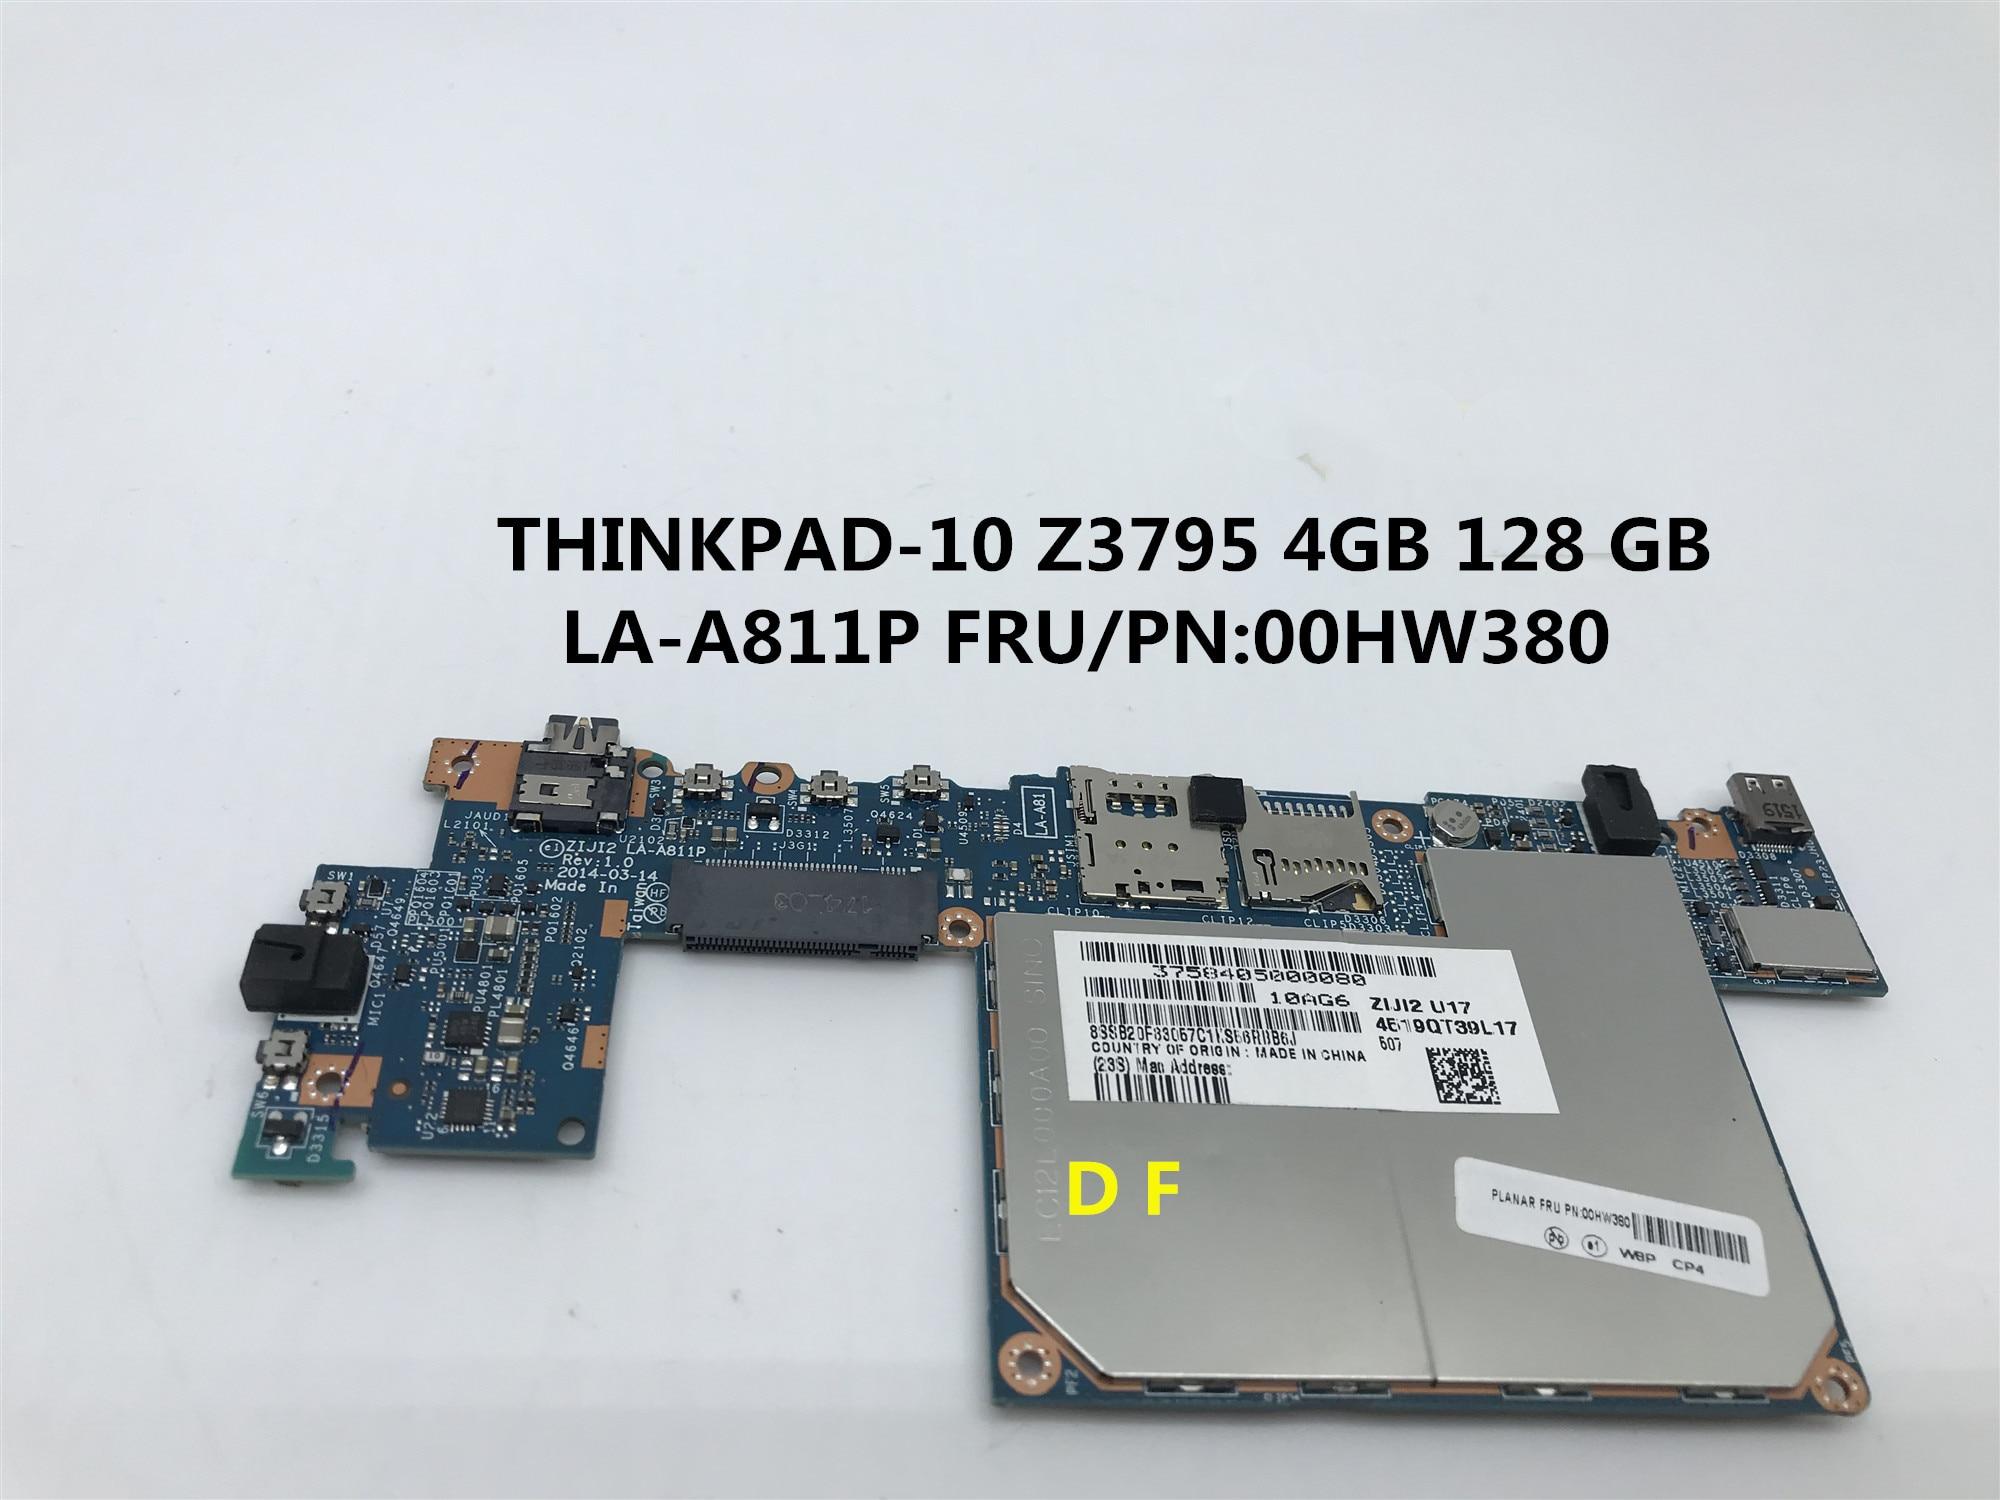 FRU 00HW380 LA-A811P para Lenovo ThinkPad 10 ThinkPad10 placa base de computadora portátil W8P... Z3795 4GB 64GB 100% prueba OK